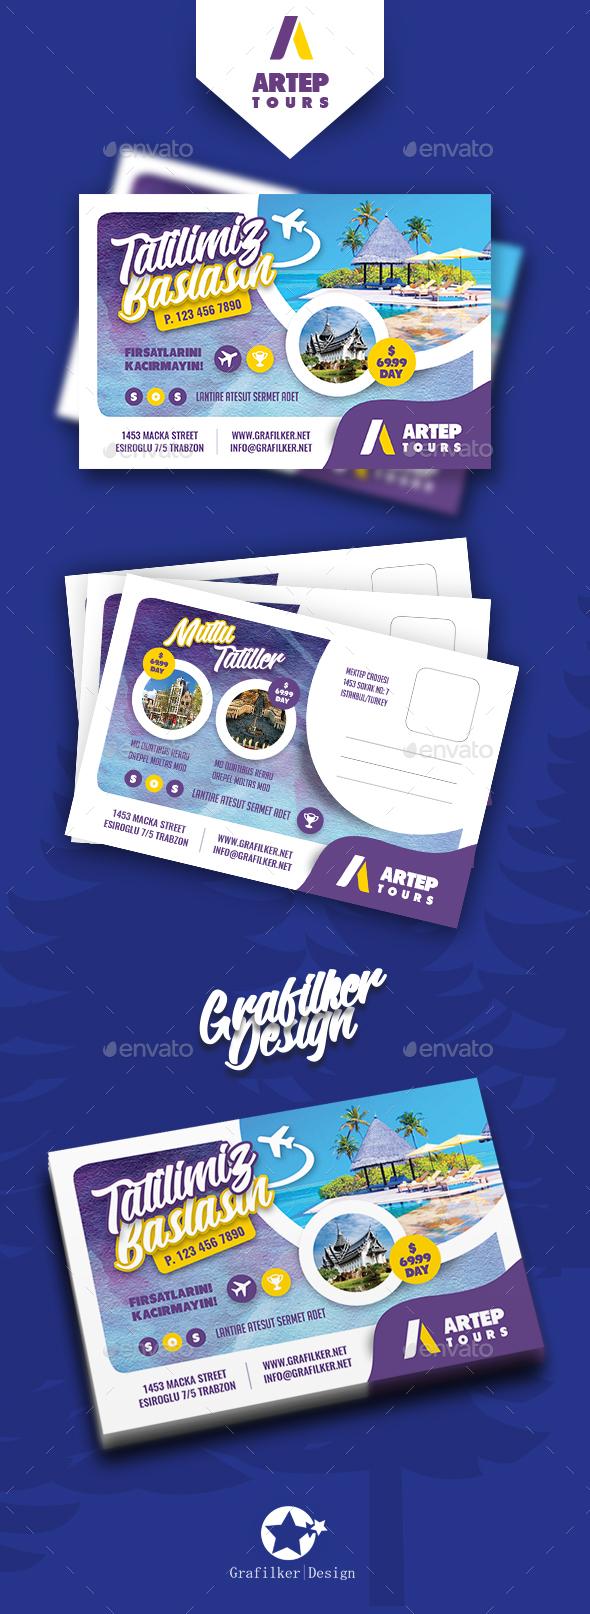 Travel Tour Postcard Templates - Cards & Invites Print Templates